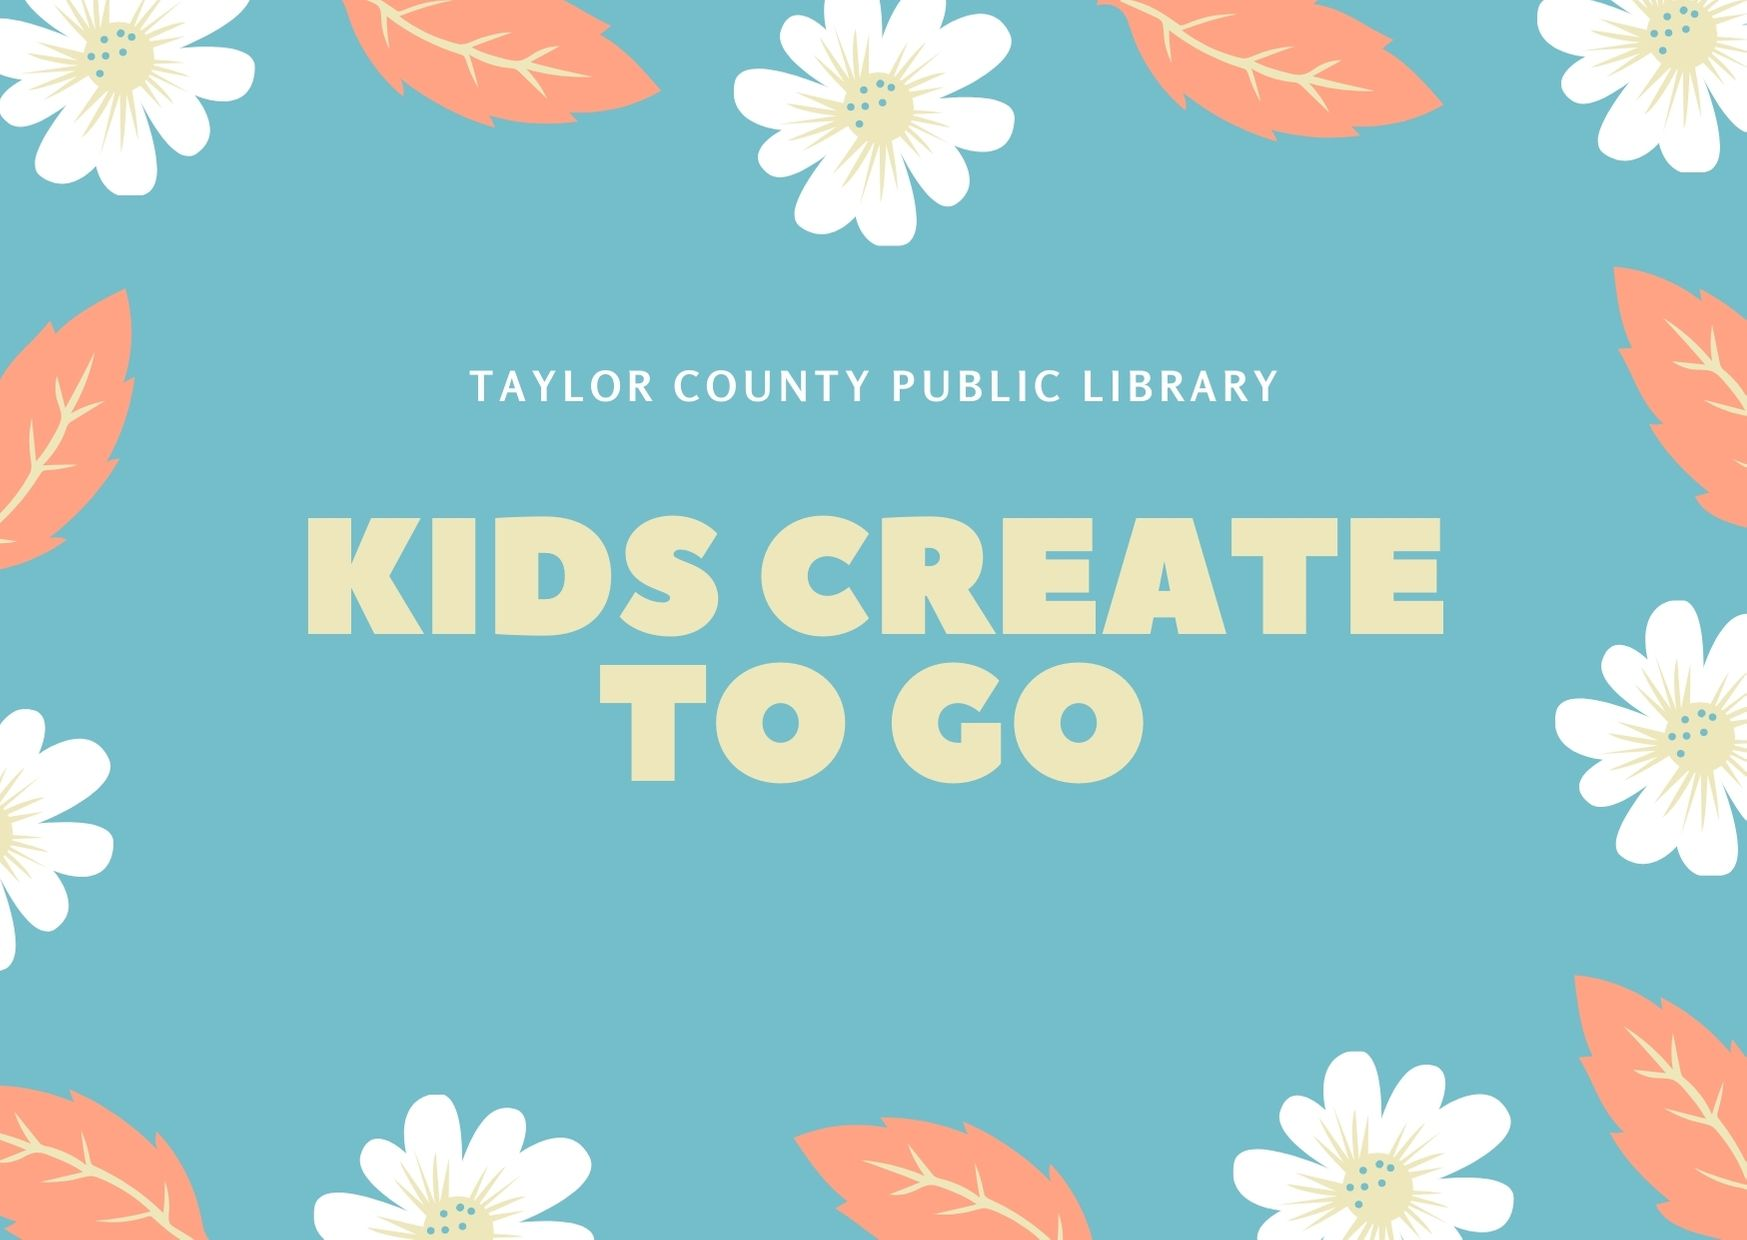 Kids Create To Go!